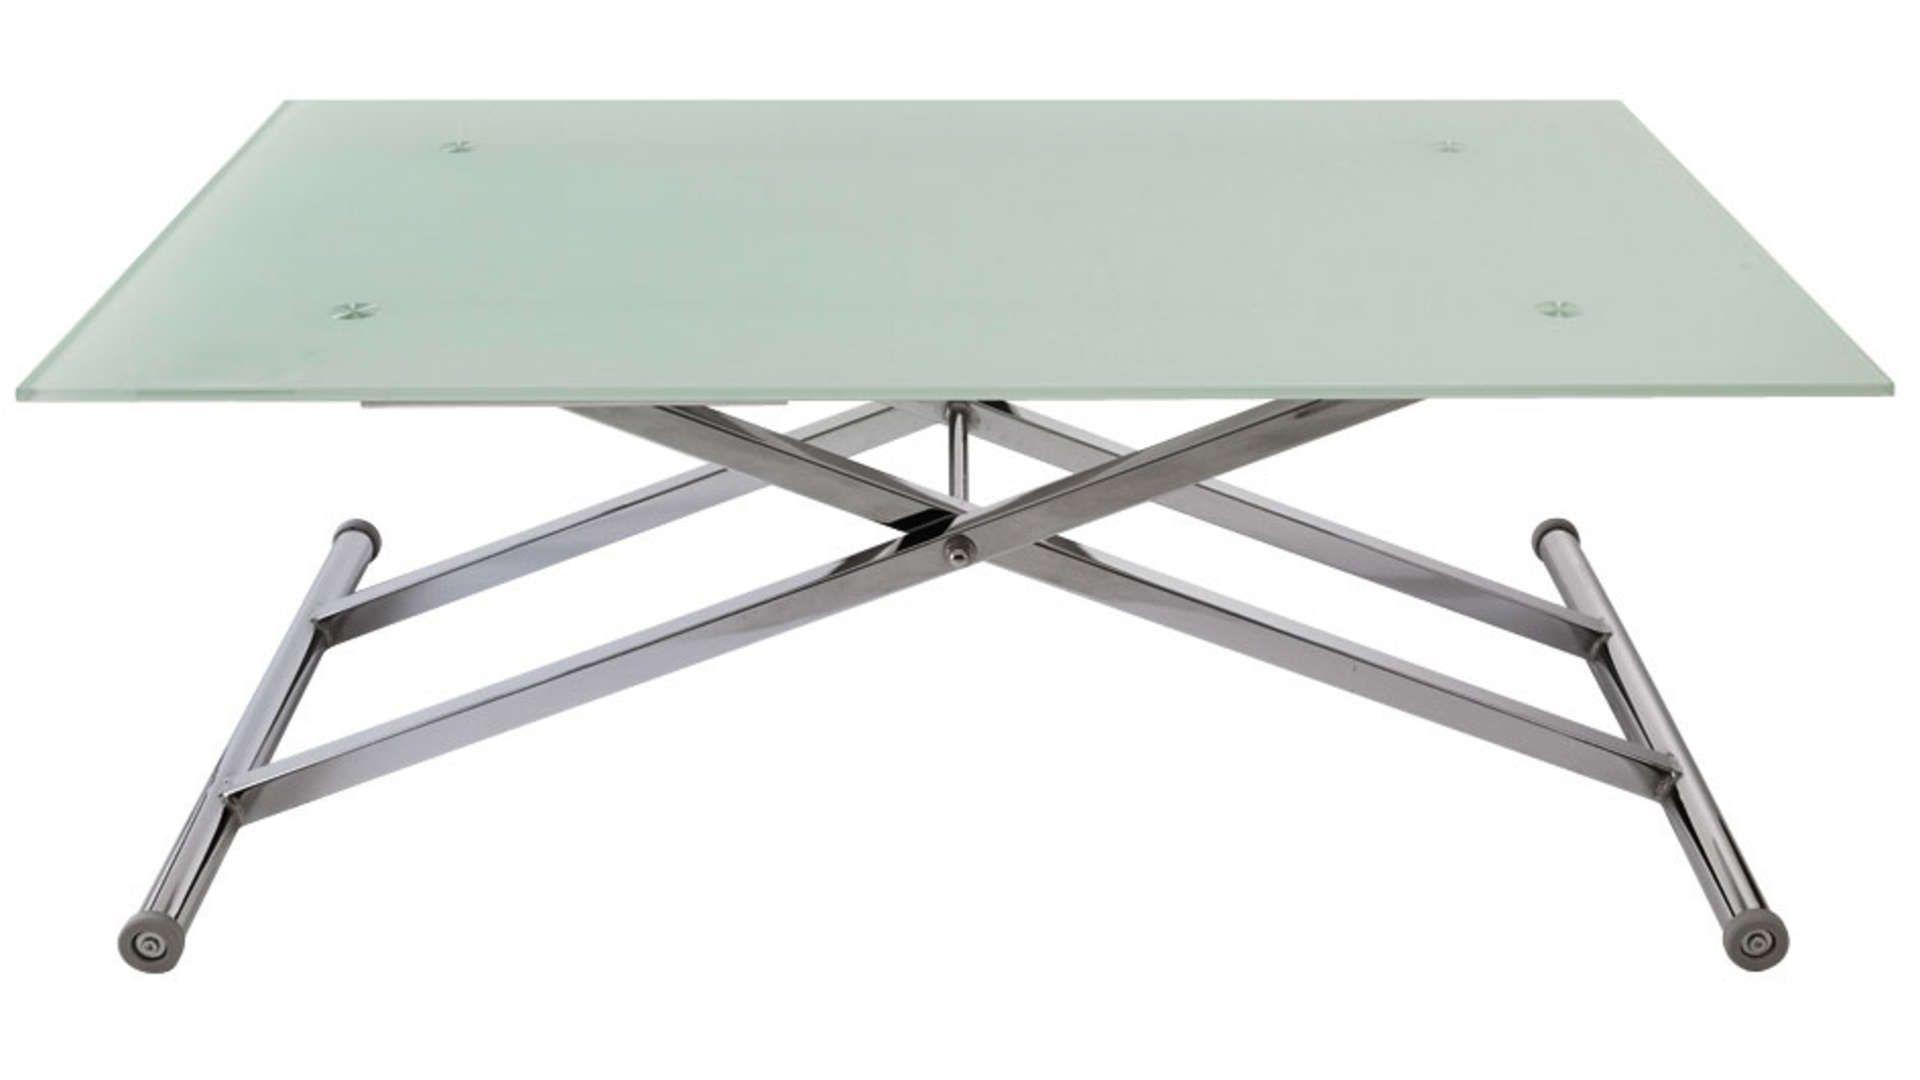 Table Basse Moov Up Table Basse Table Basse Conforama Et Table Basse Rectangulaire